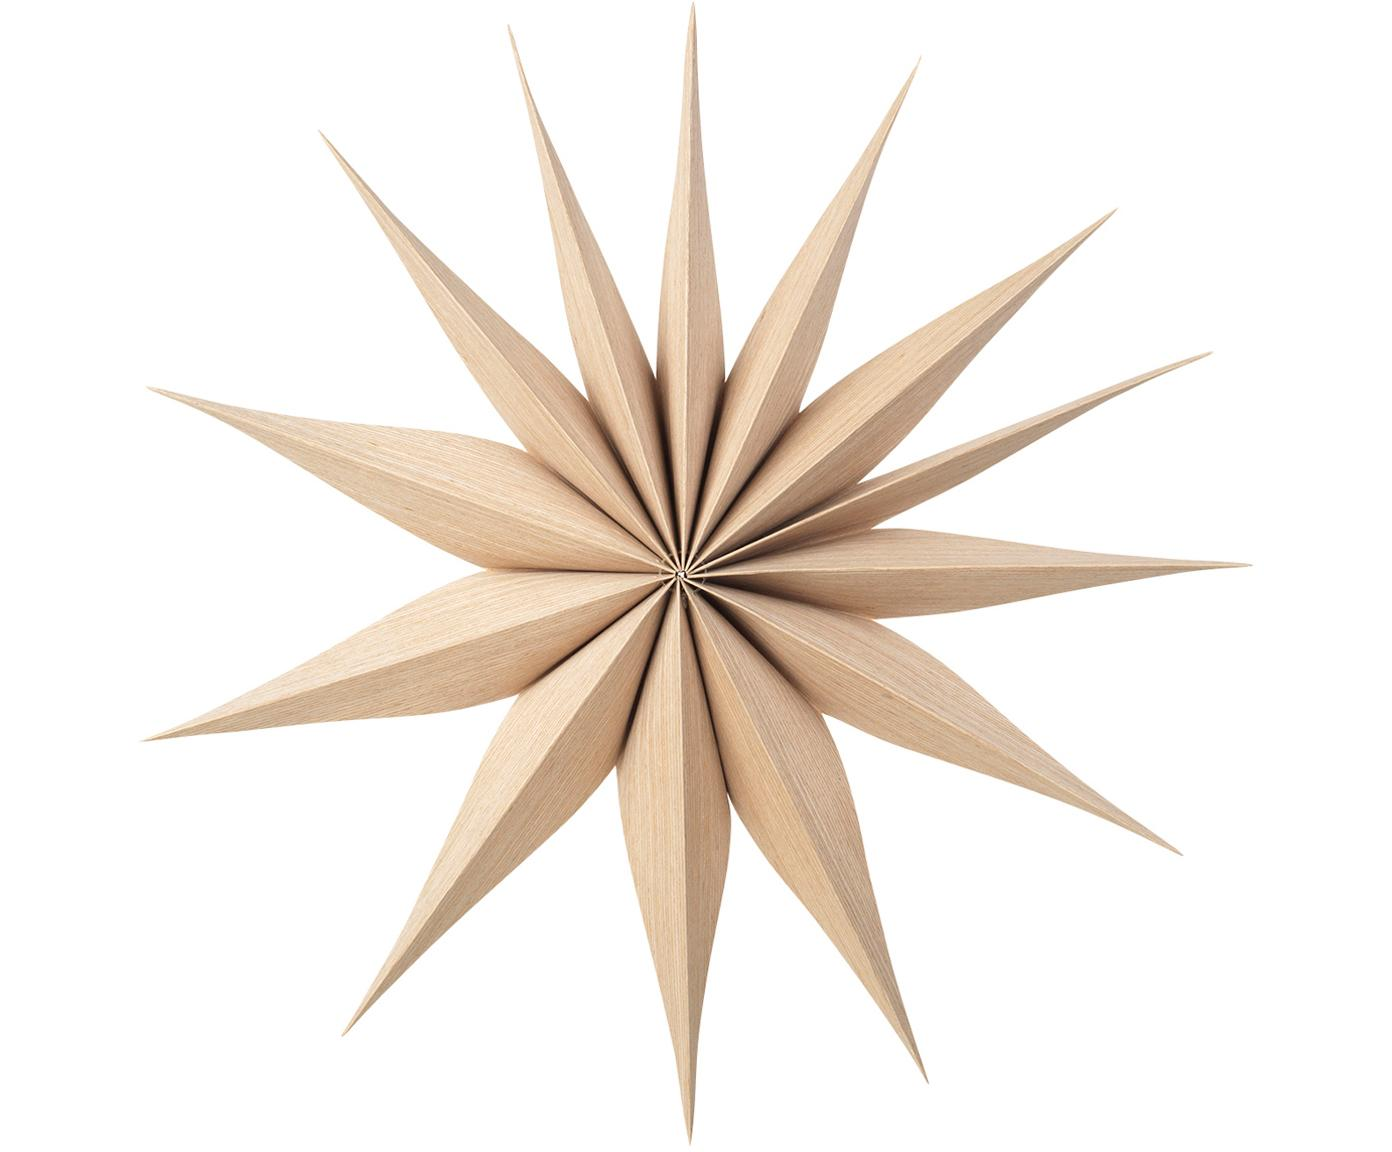 Decoratieve sterren Venok, 2 stuks, Dun hout, Lichtbruin, Ø 40 cm